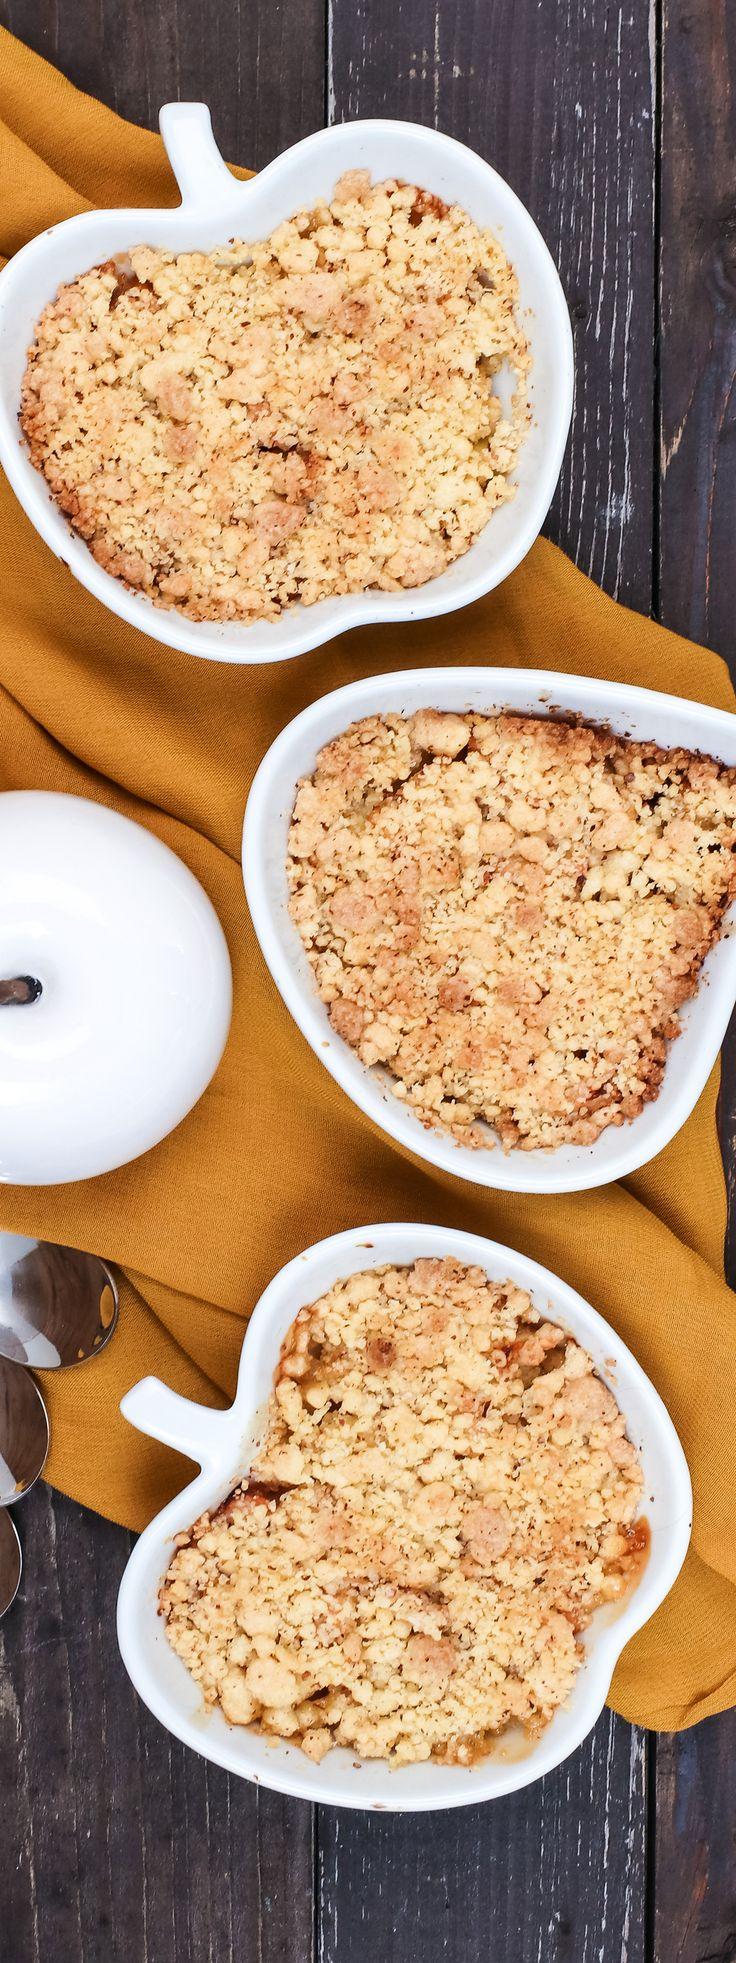 Rezept: Apfel-Quitten-Crumble - Das perfekte Herbst-Dessert | Filizity.com | Food-Blog aus Koblenz #herbst #apfel